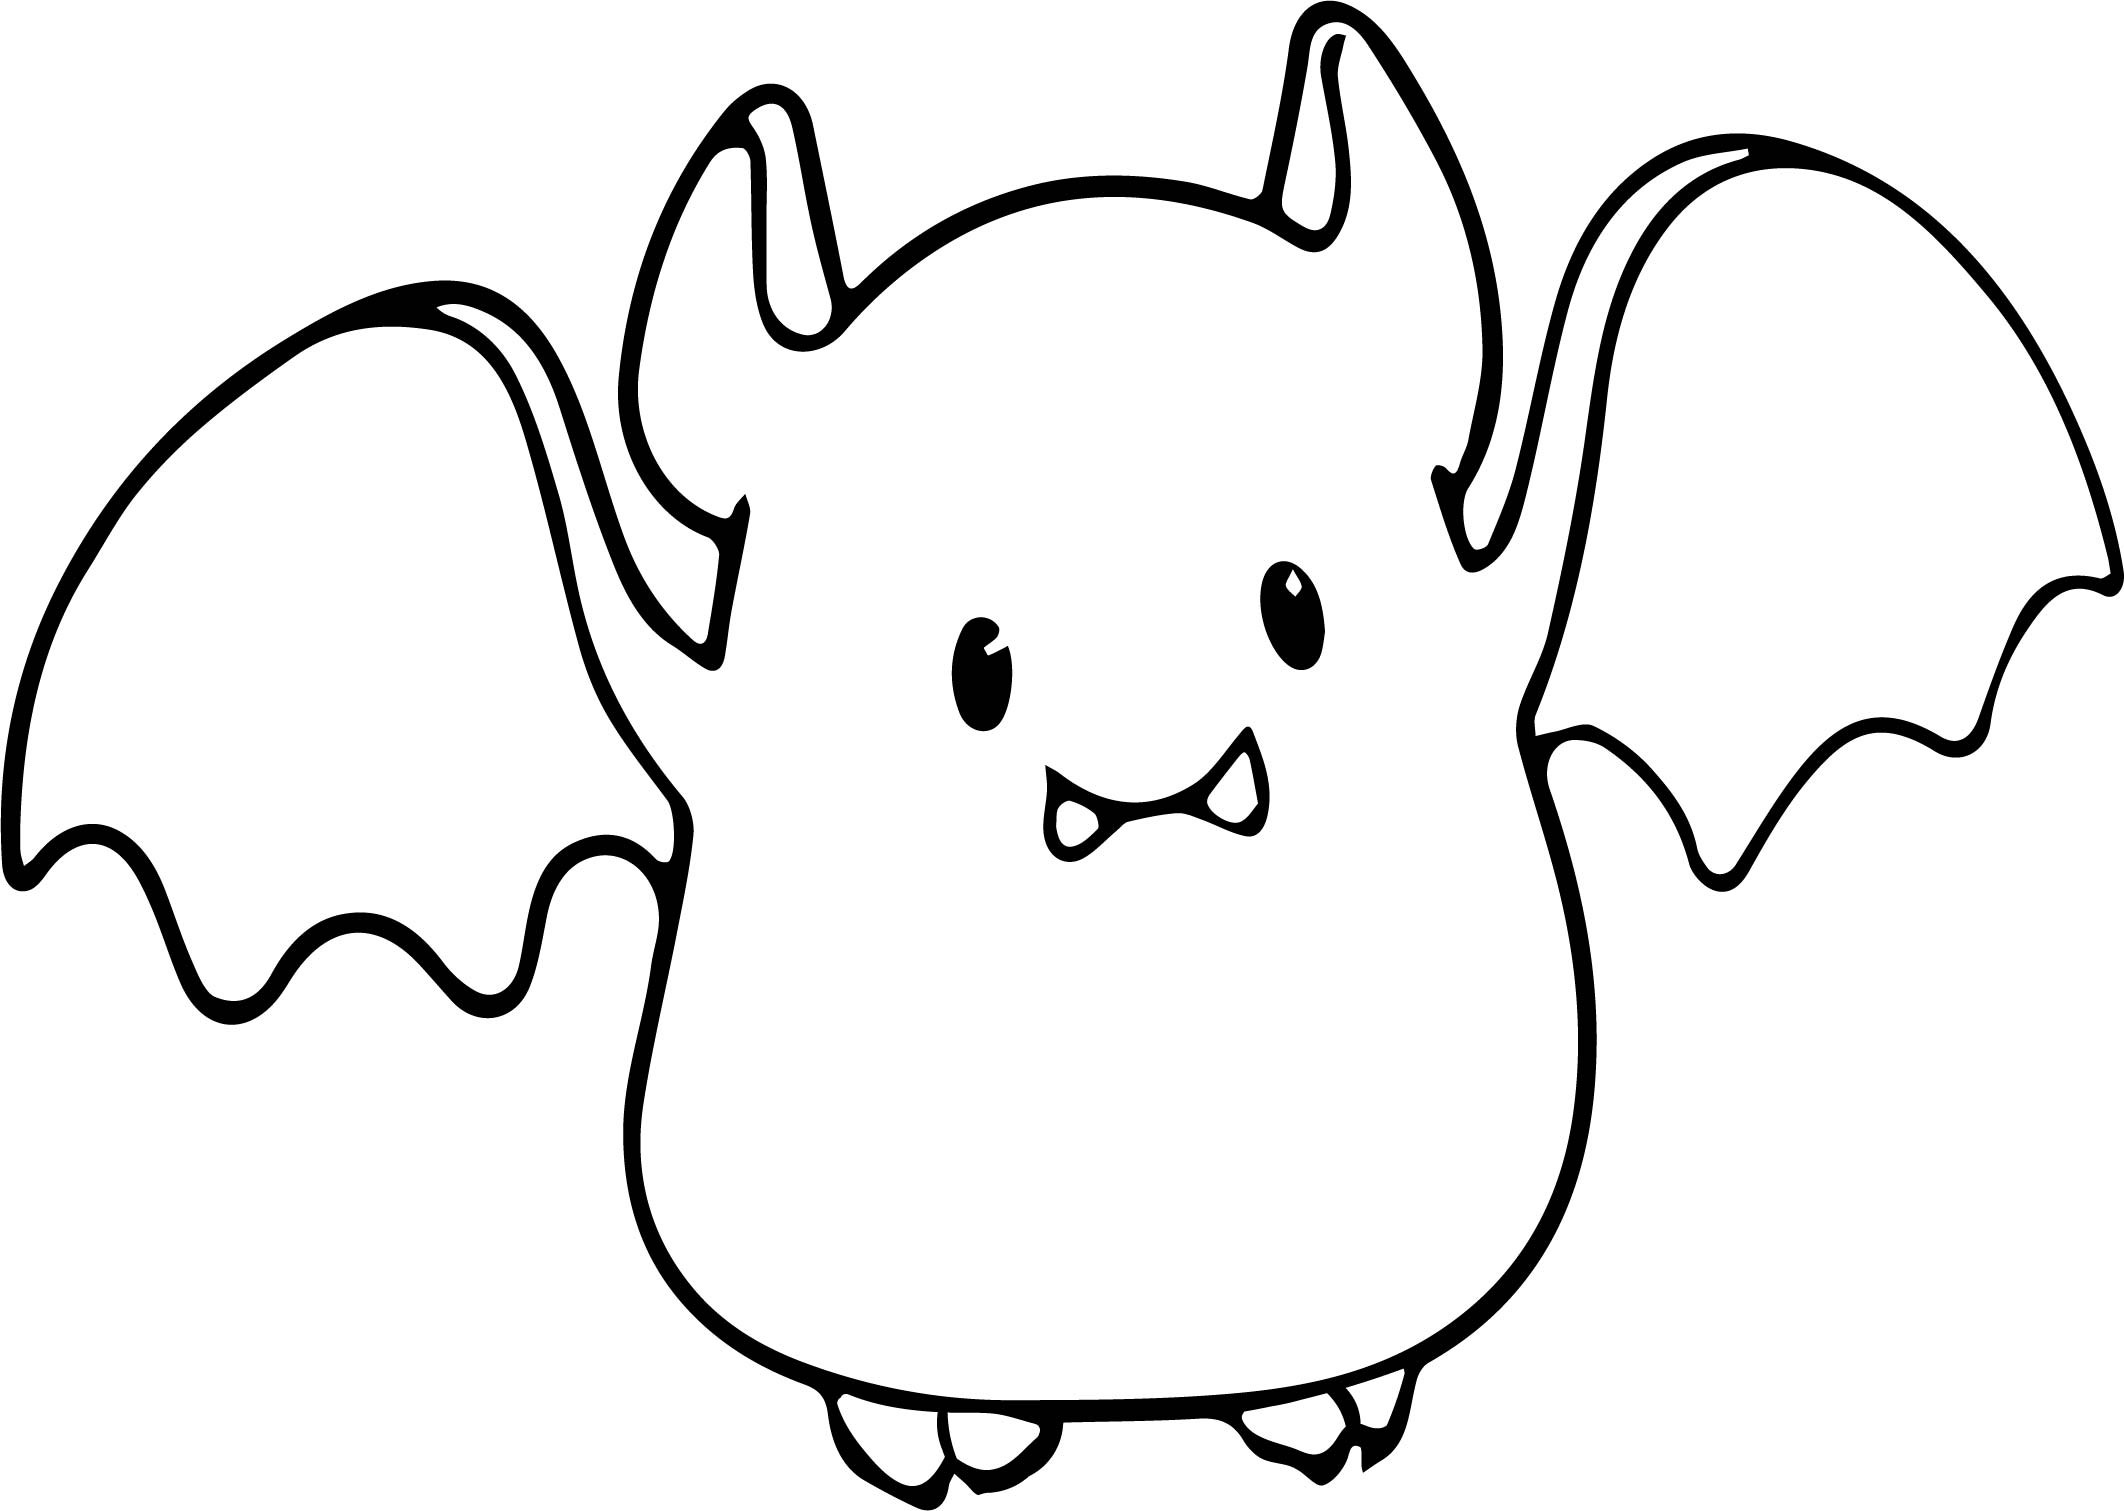 Cute Bat Coloring Pages  Small Cute Baby Cartoon Vampire Bat Coloring Page